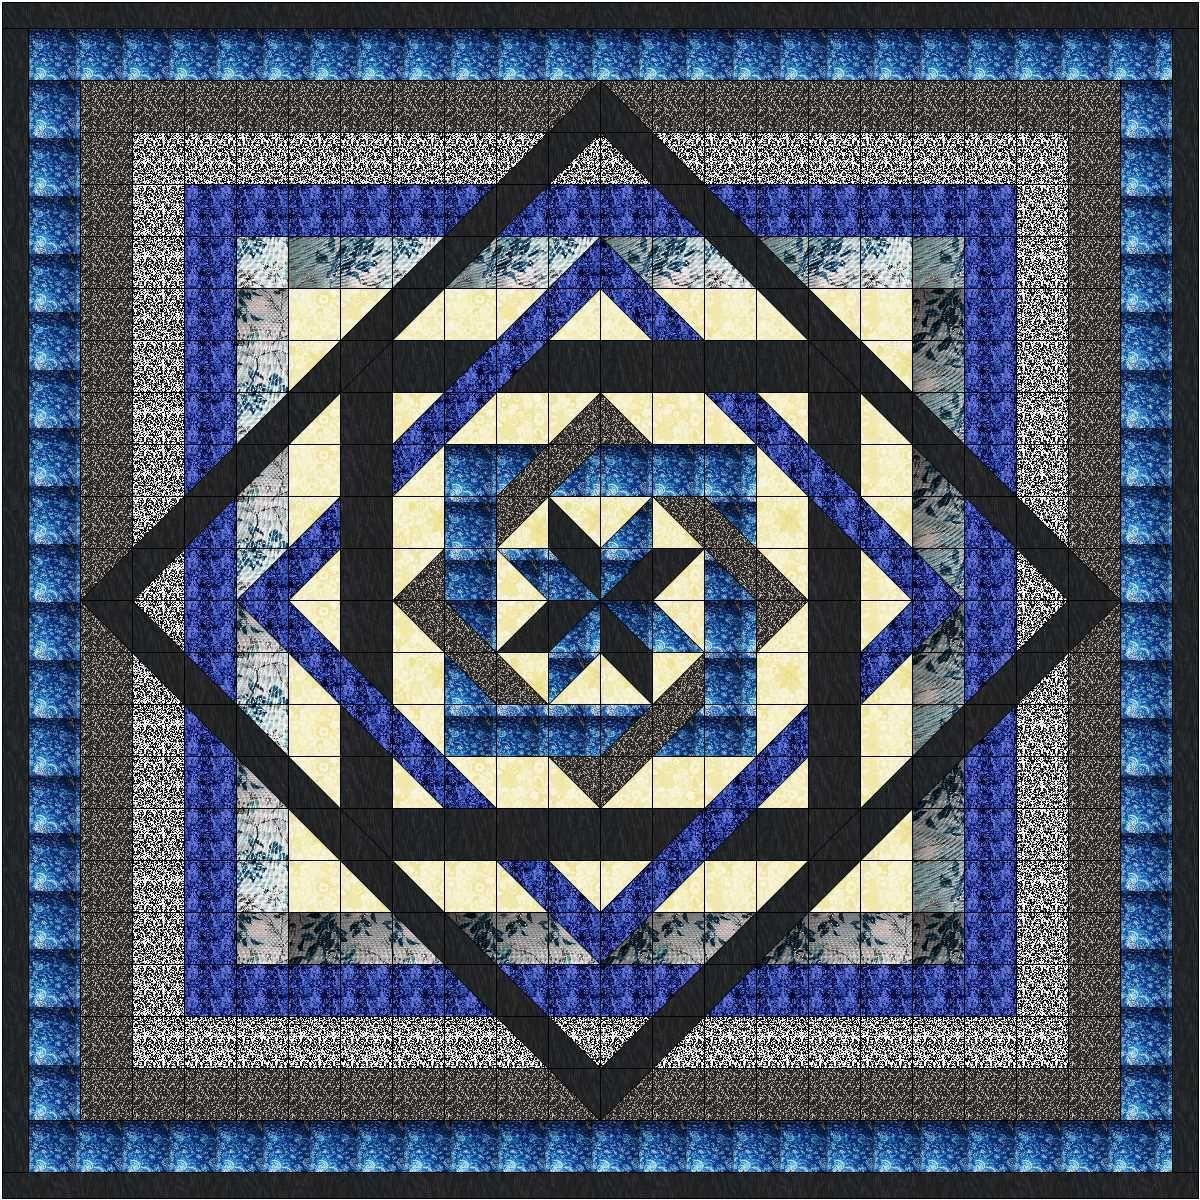 Quilting Kits 19160: Easy Quilt Kit Tumbling Star Blues Black Pre ... : easy quilt kits - Adamdwight.com